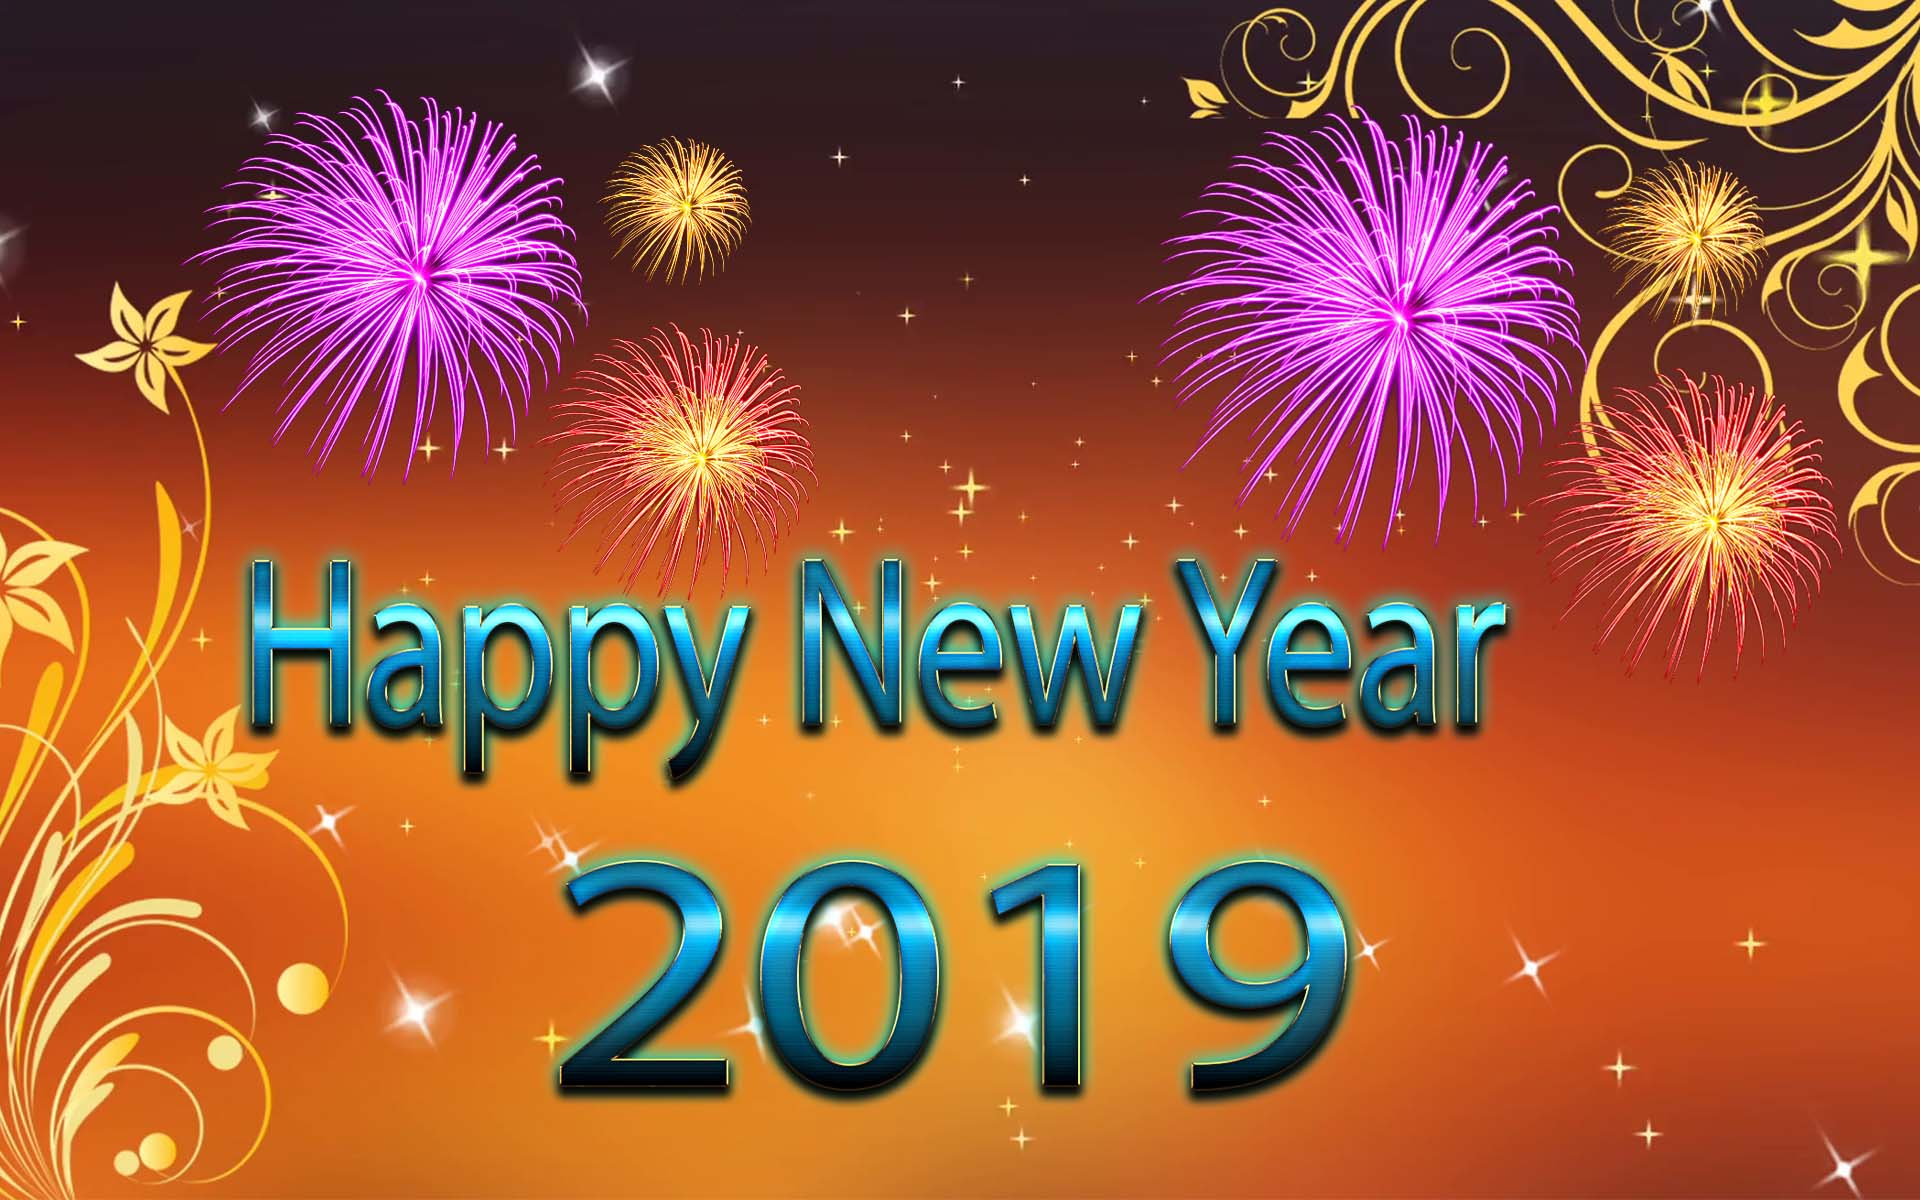 HD happy new year 2019 wallpaper